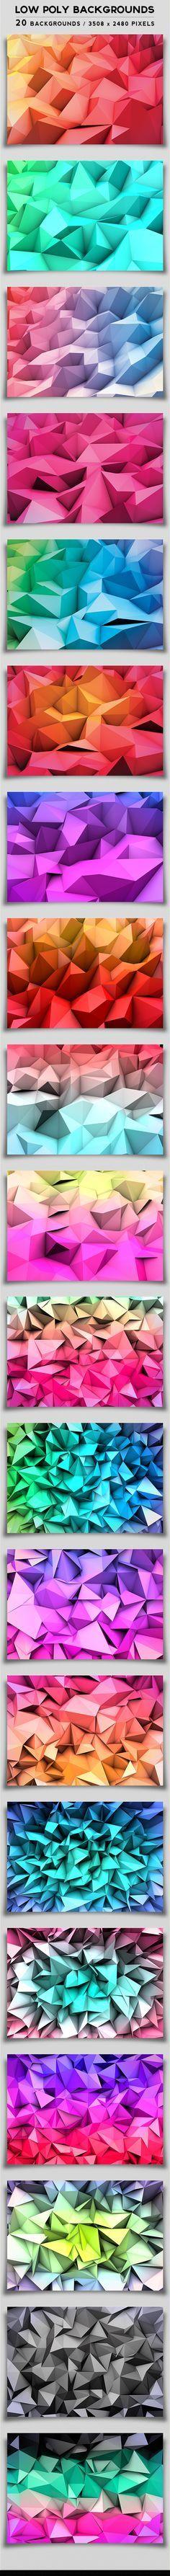 Low Poly Backgrounds by Darius Zan, via Behance